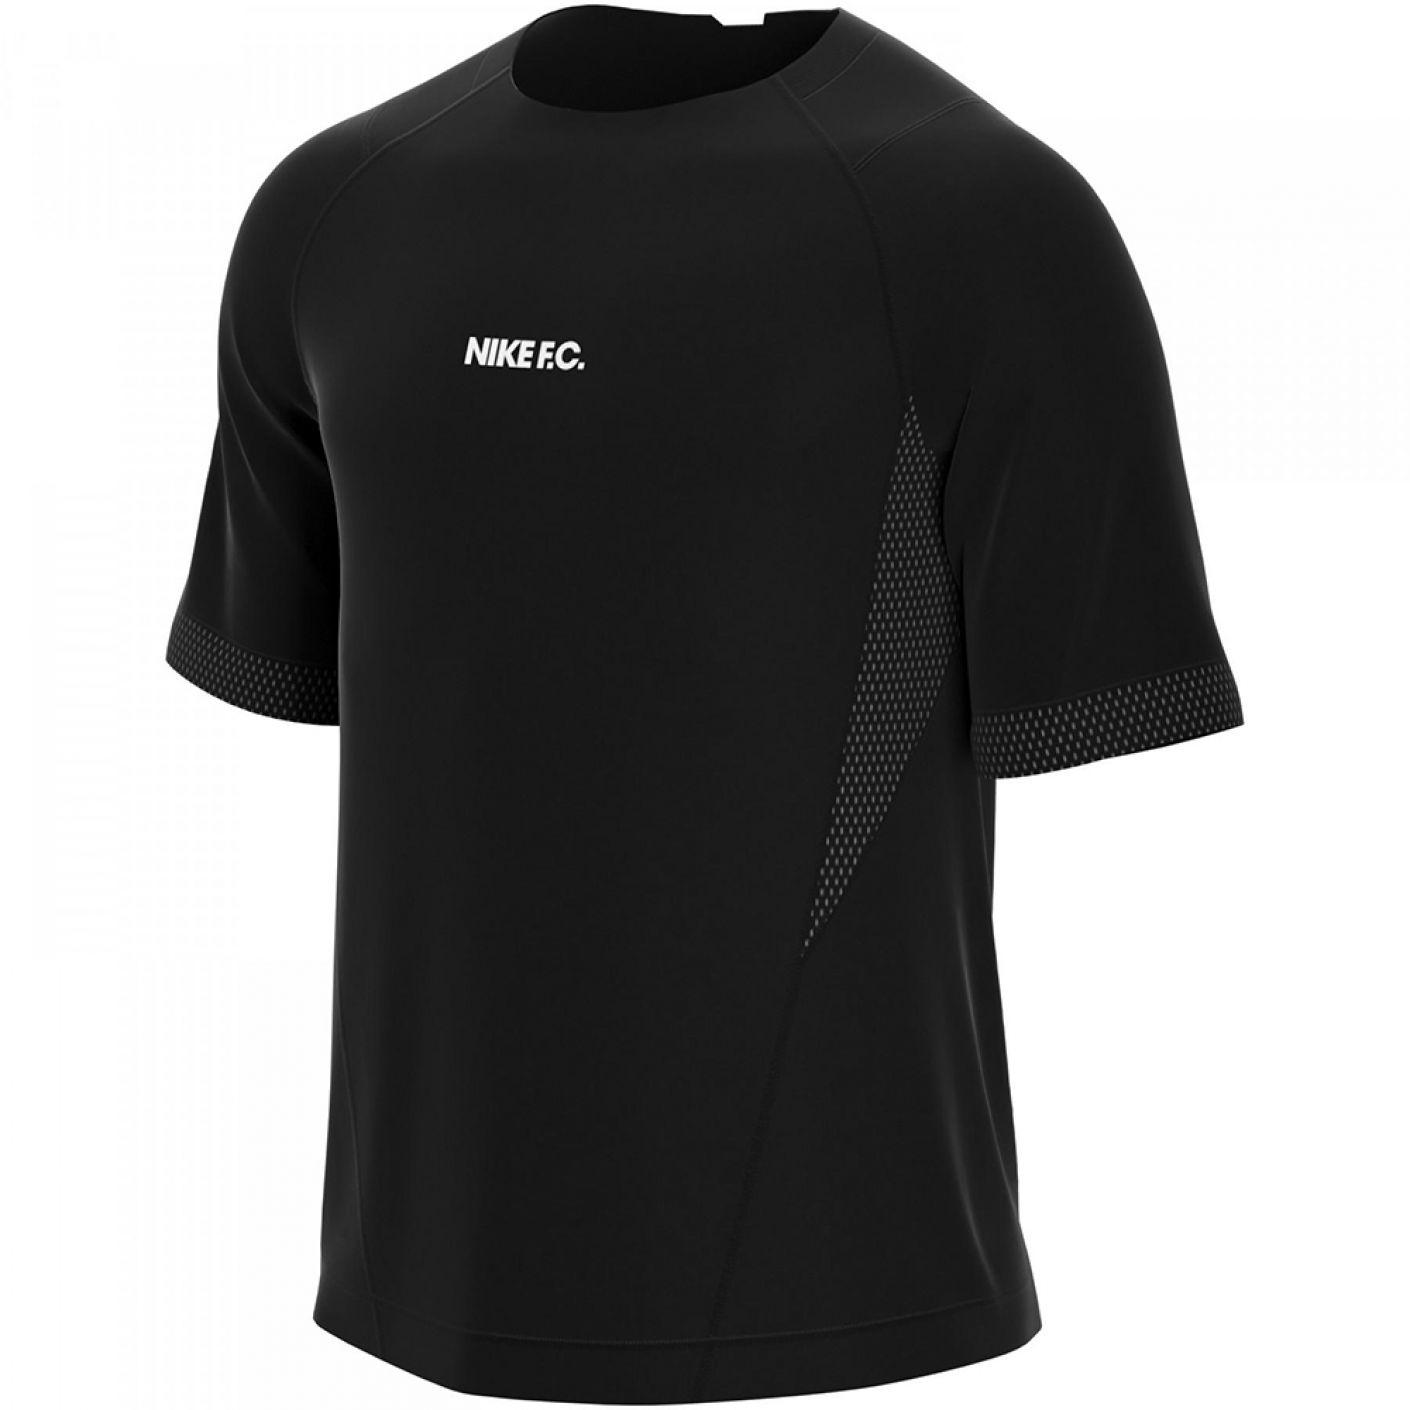 Nike F.C. Elite Trainingsshirt Zwart Wit